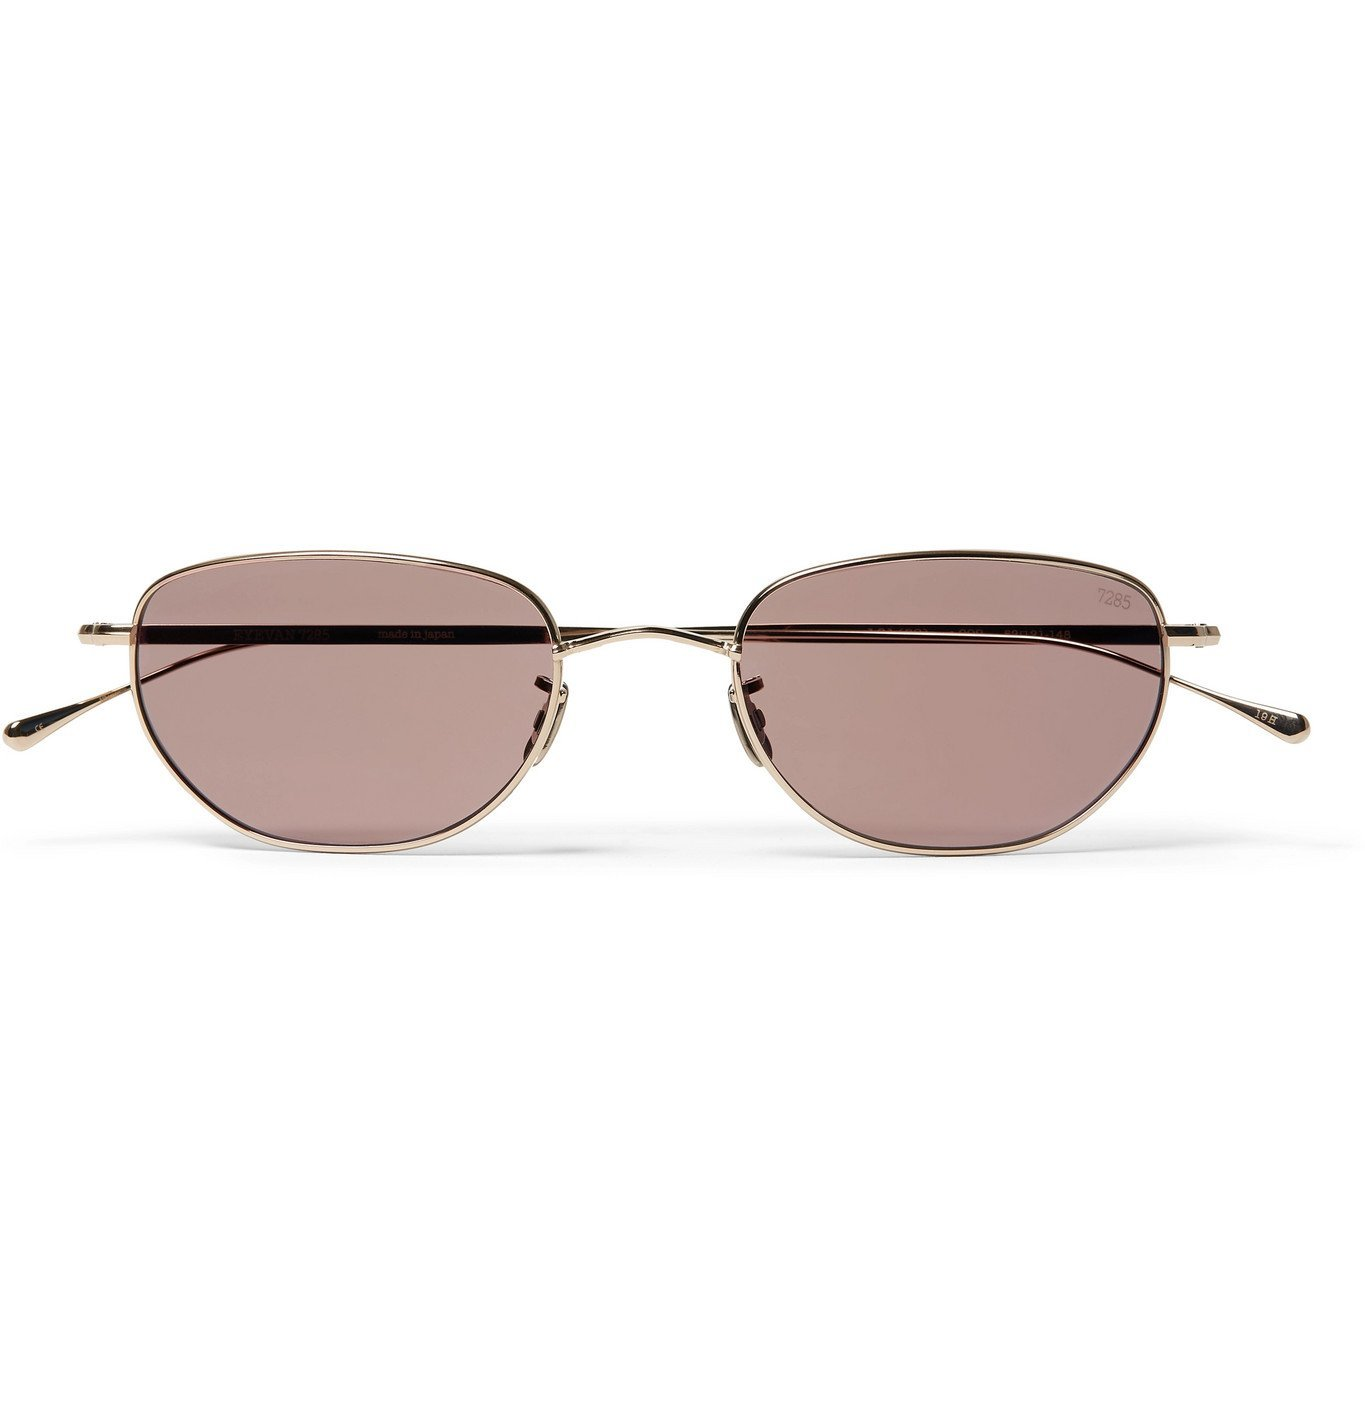 Photo: Eyevan 7285 - Oval-Frame Gold-Tone Titanium Sunglasses - Silver